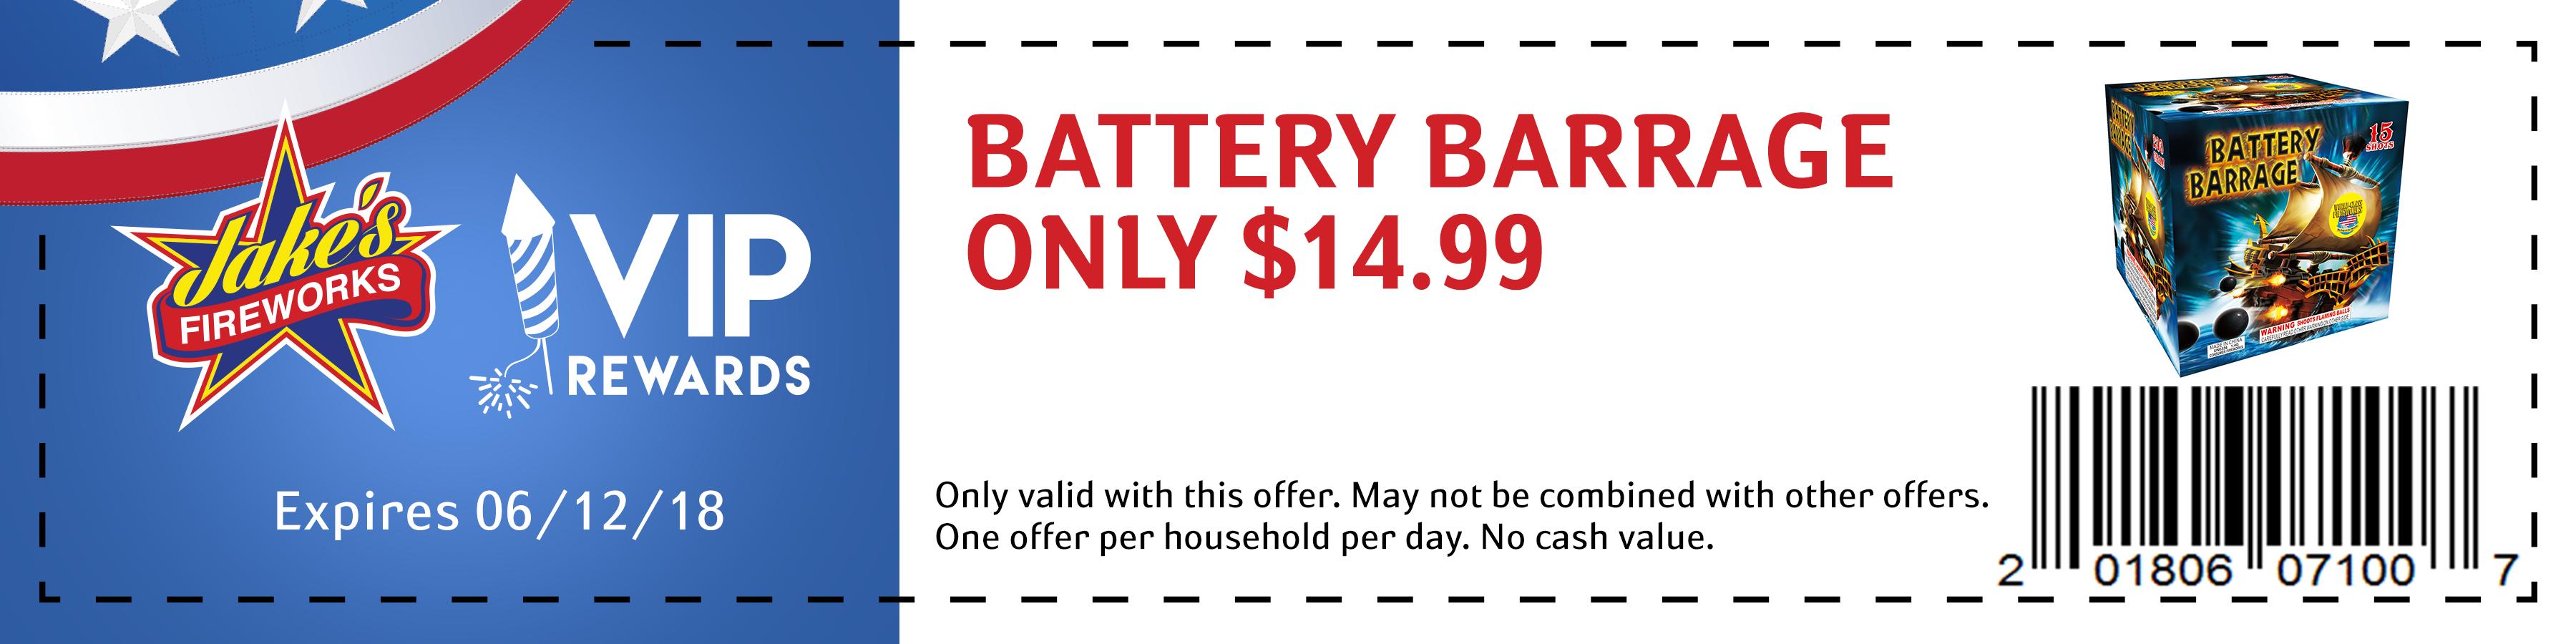 JF-BatteryBarrage_14_99